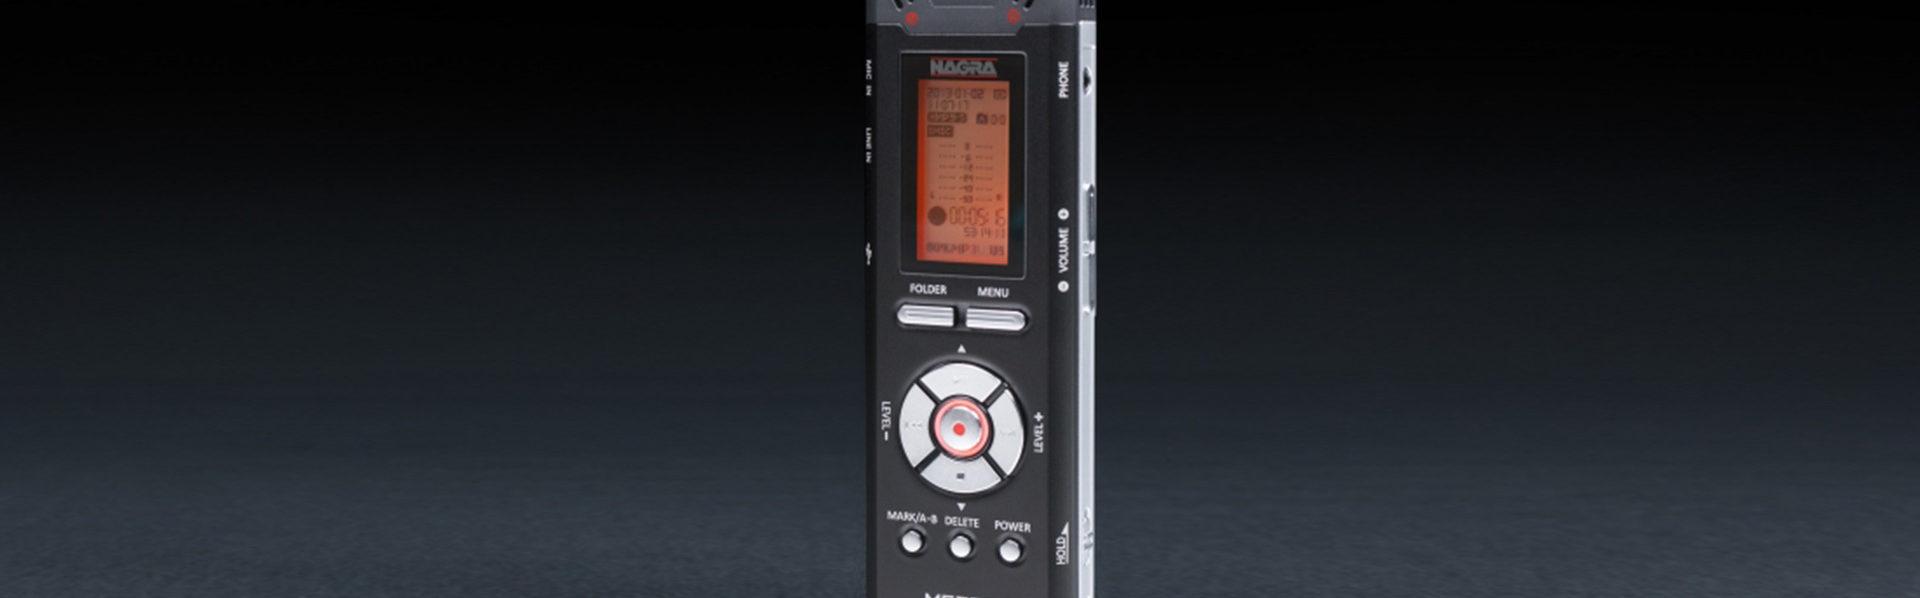 Nagra Mezzo miniature recorder handheld digital front phone rec mic